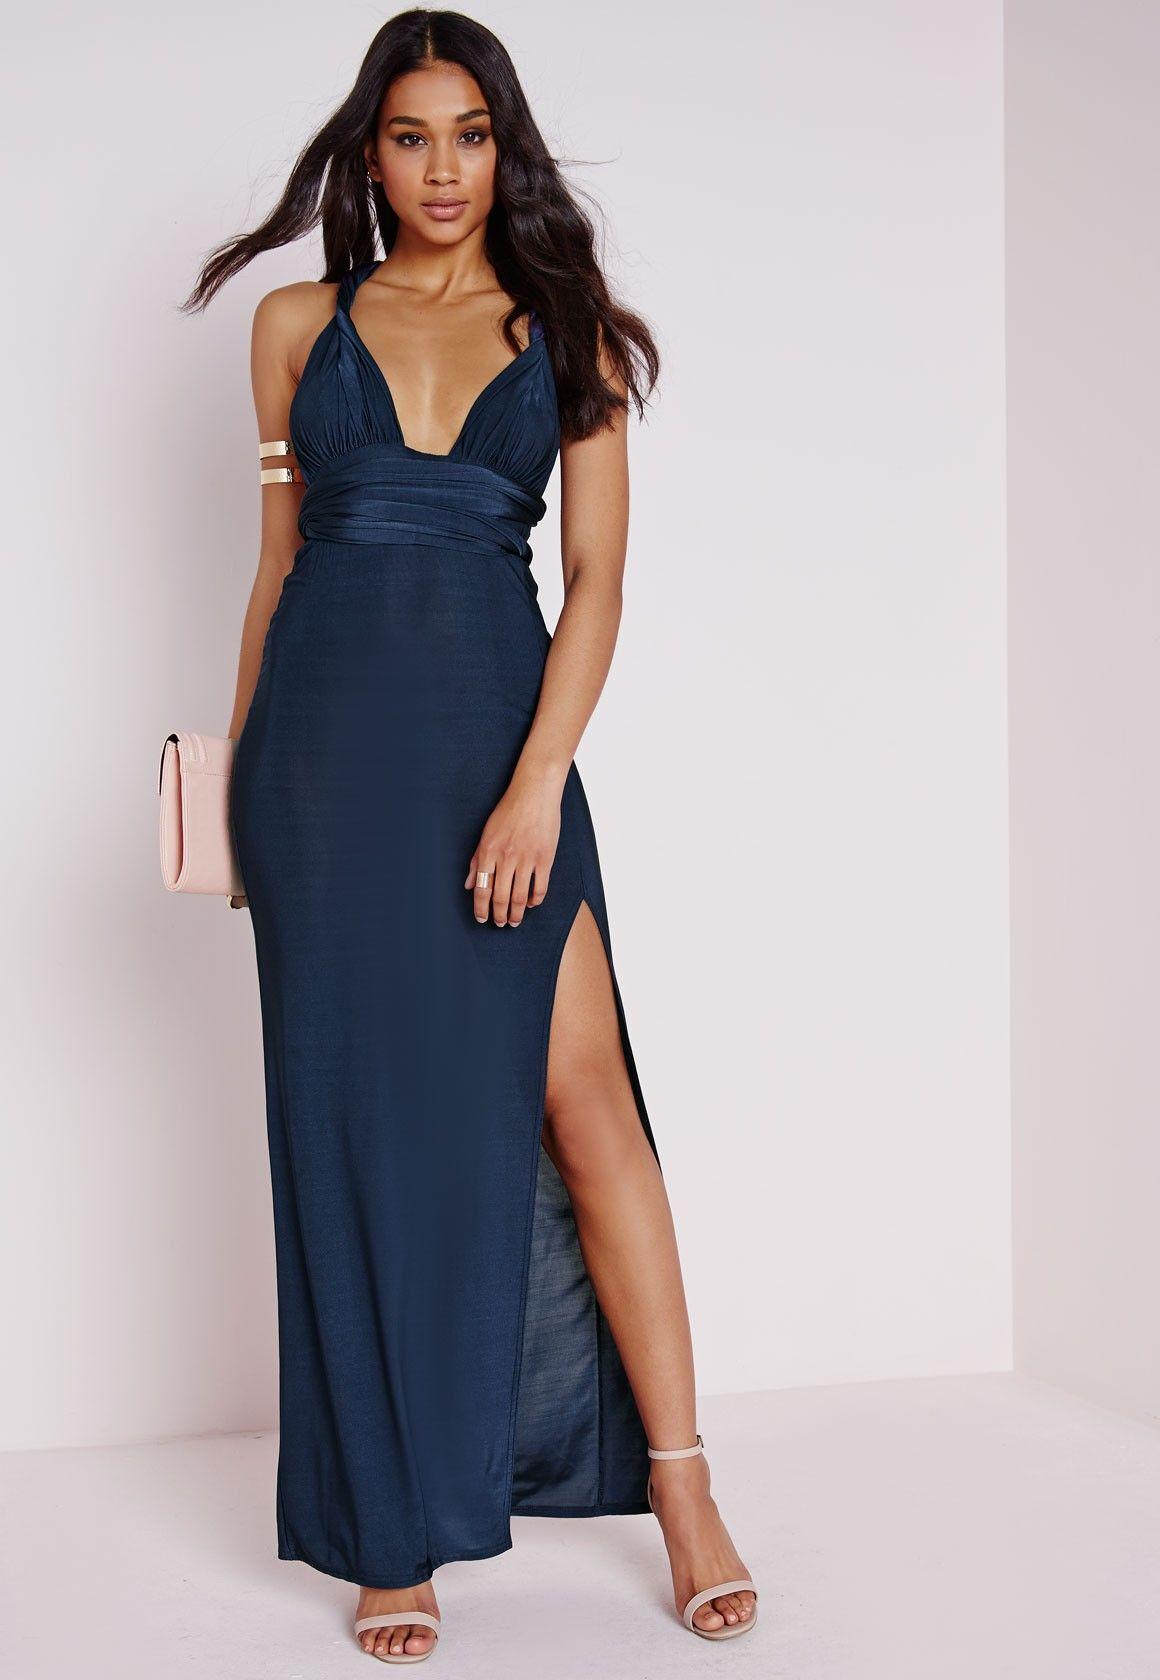 e0e87e2562c Do Me Any Way Multiway Slinky Maxi Dress Navy - Dresses - Maxi Dresses -  Missguided